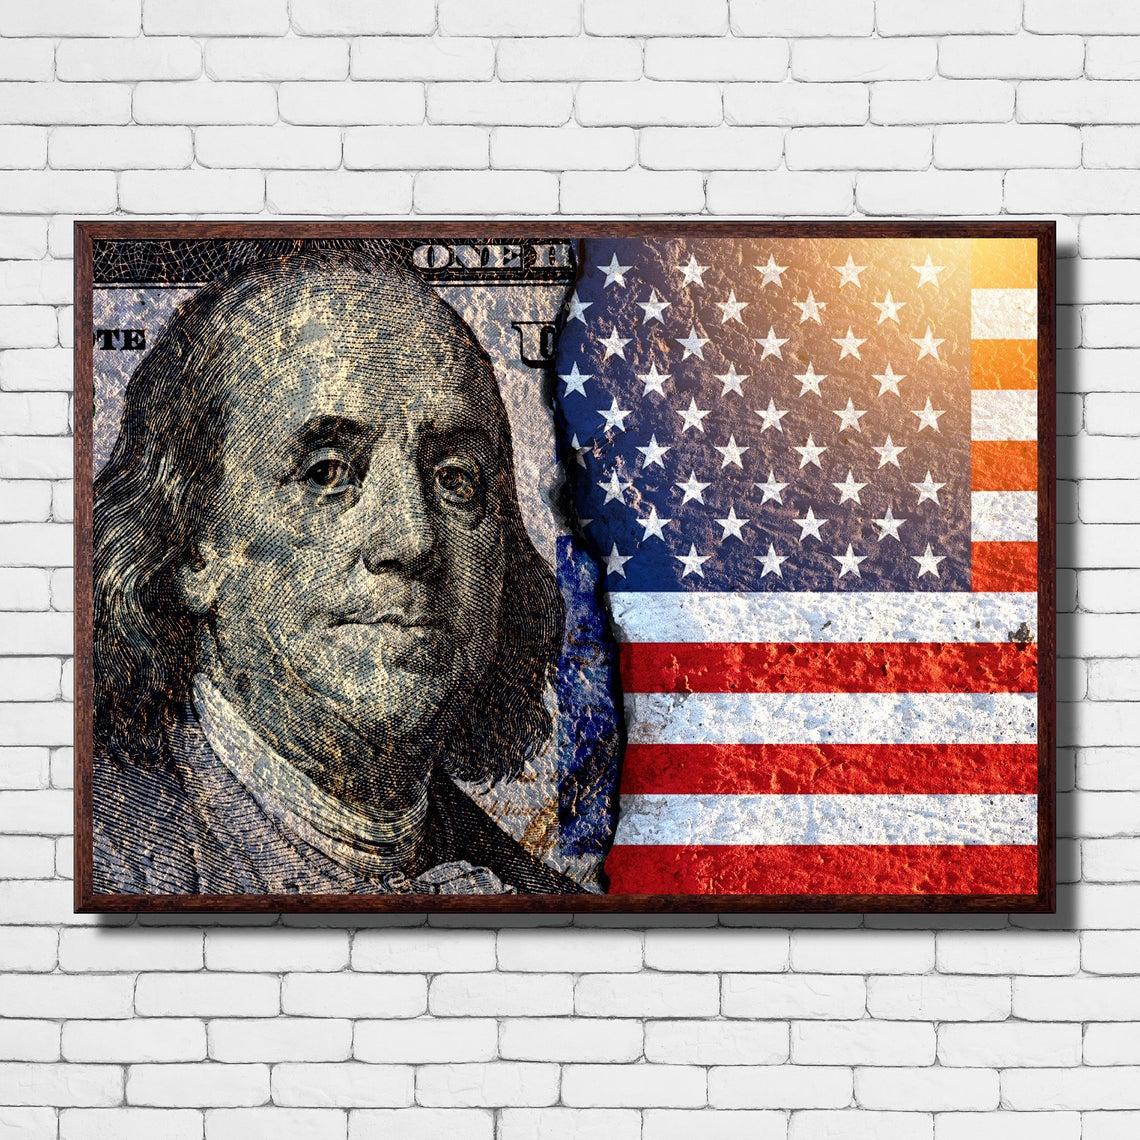 United States of America Flag Vintage Canvas Print Decorative Wall Art Modern